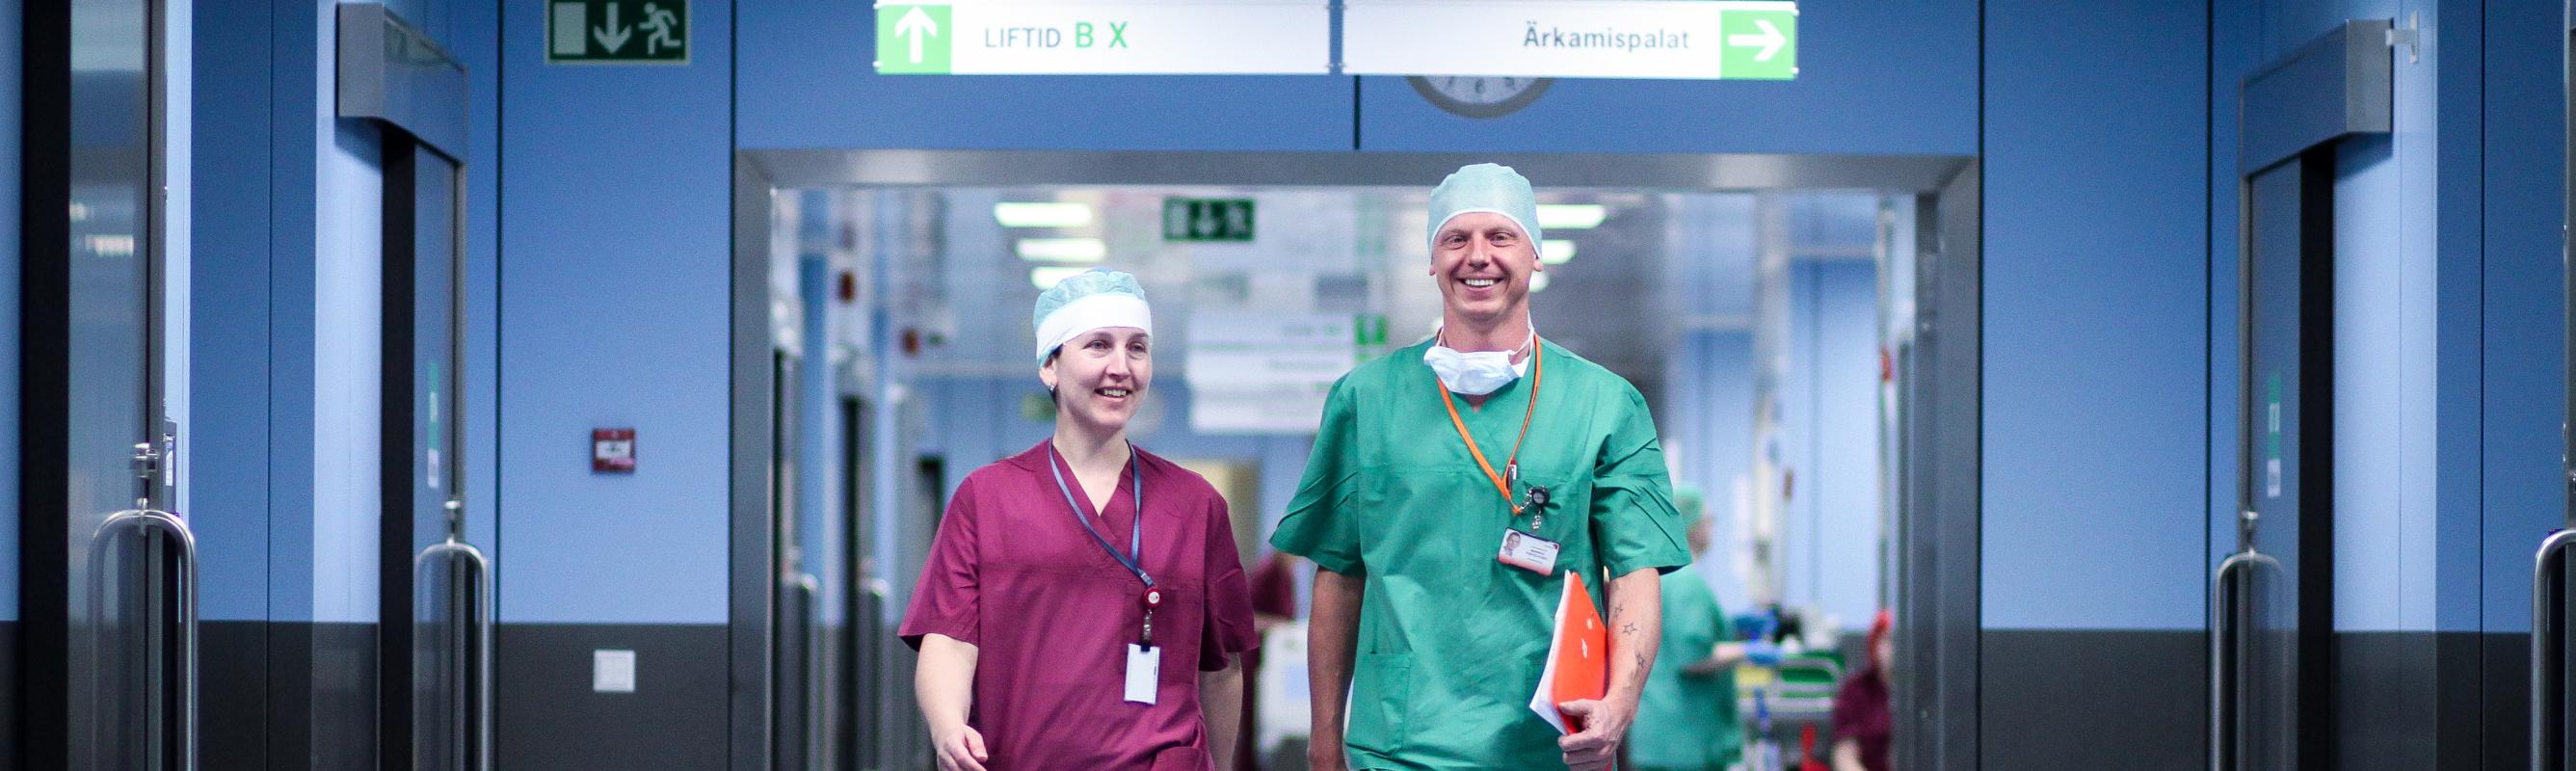 Operatsioonikeskuse õendusjuht Kai Slet ja operatsioonikeskuse juhataja dr Markko Pärtelpoeg